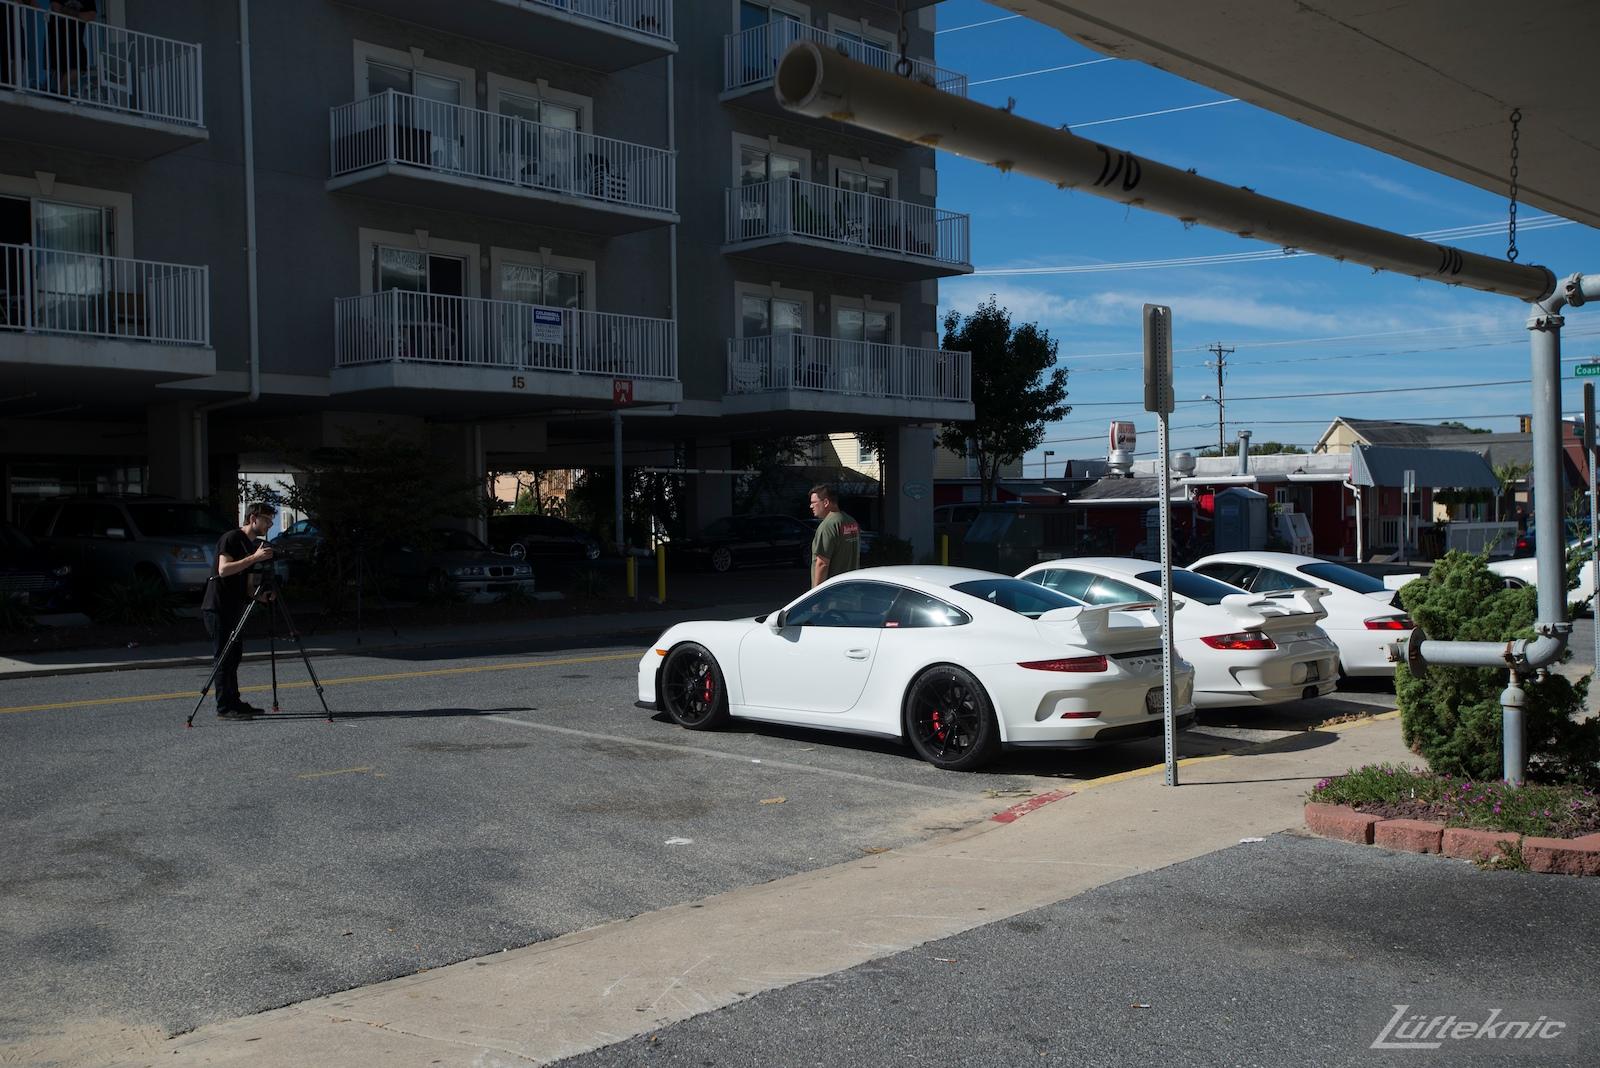 Lüfteknic Porsche 991 GT3 being filmed by IDEA television.